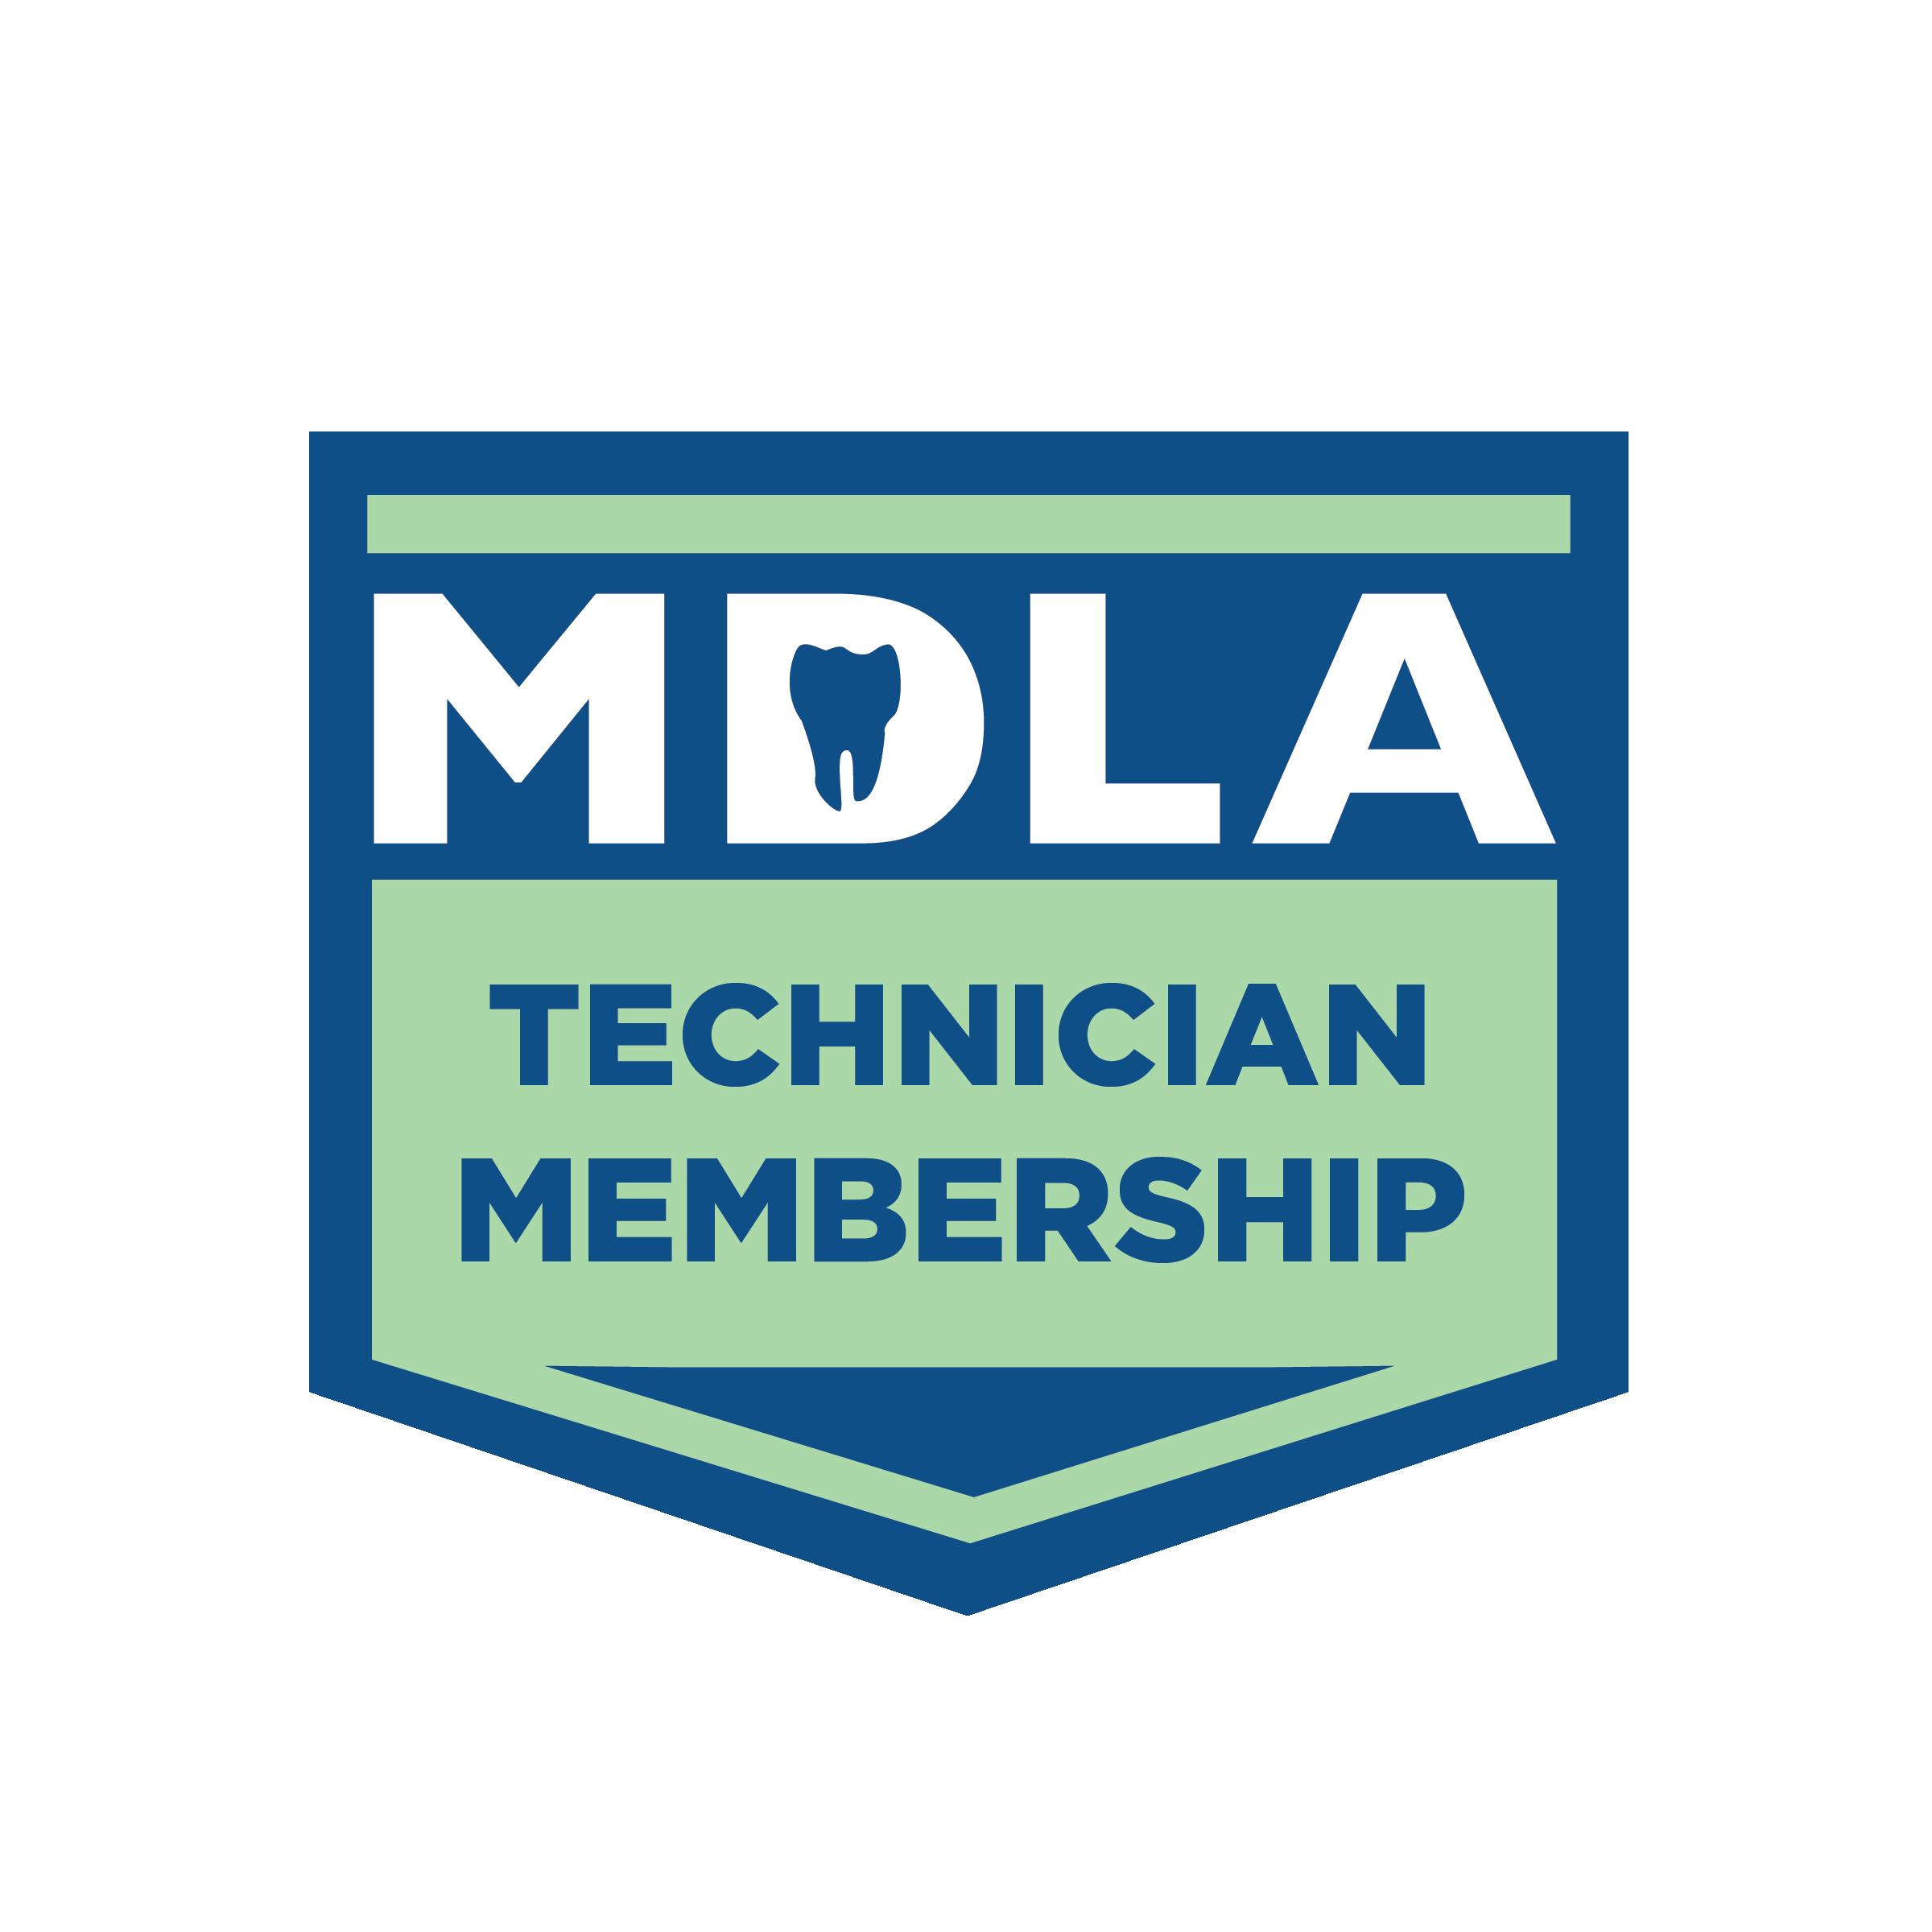 MDLA-Logo-technician-01.png